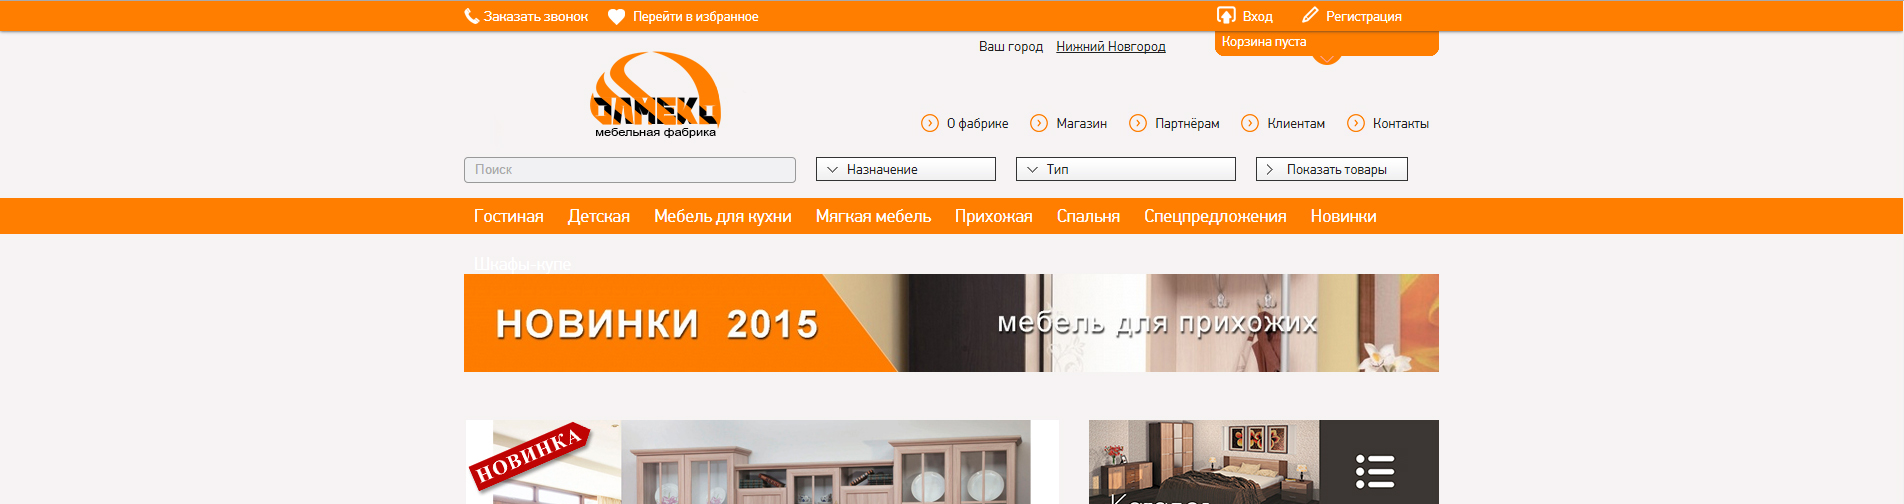 Ребрендинг/Редизайн логотипа Мебельной Фабрики фото f_92654901c46b3401.jpg